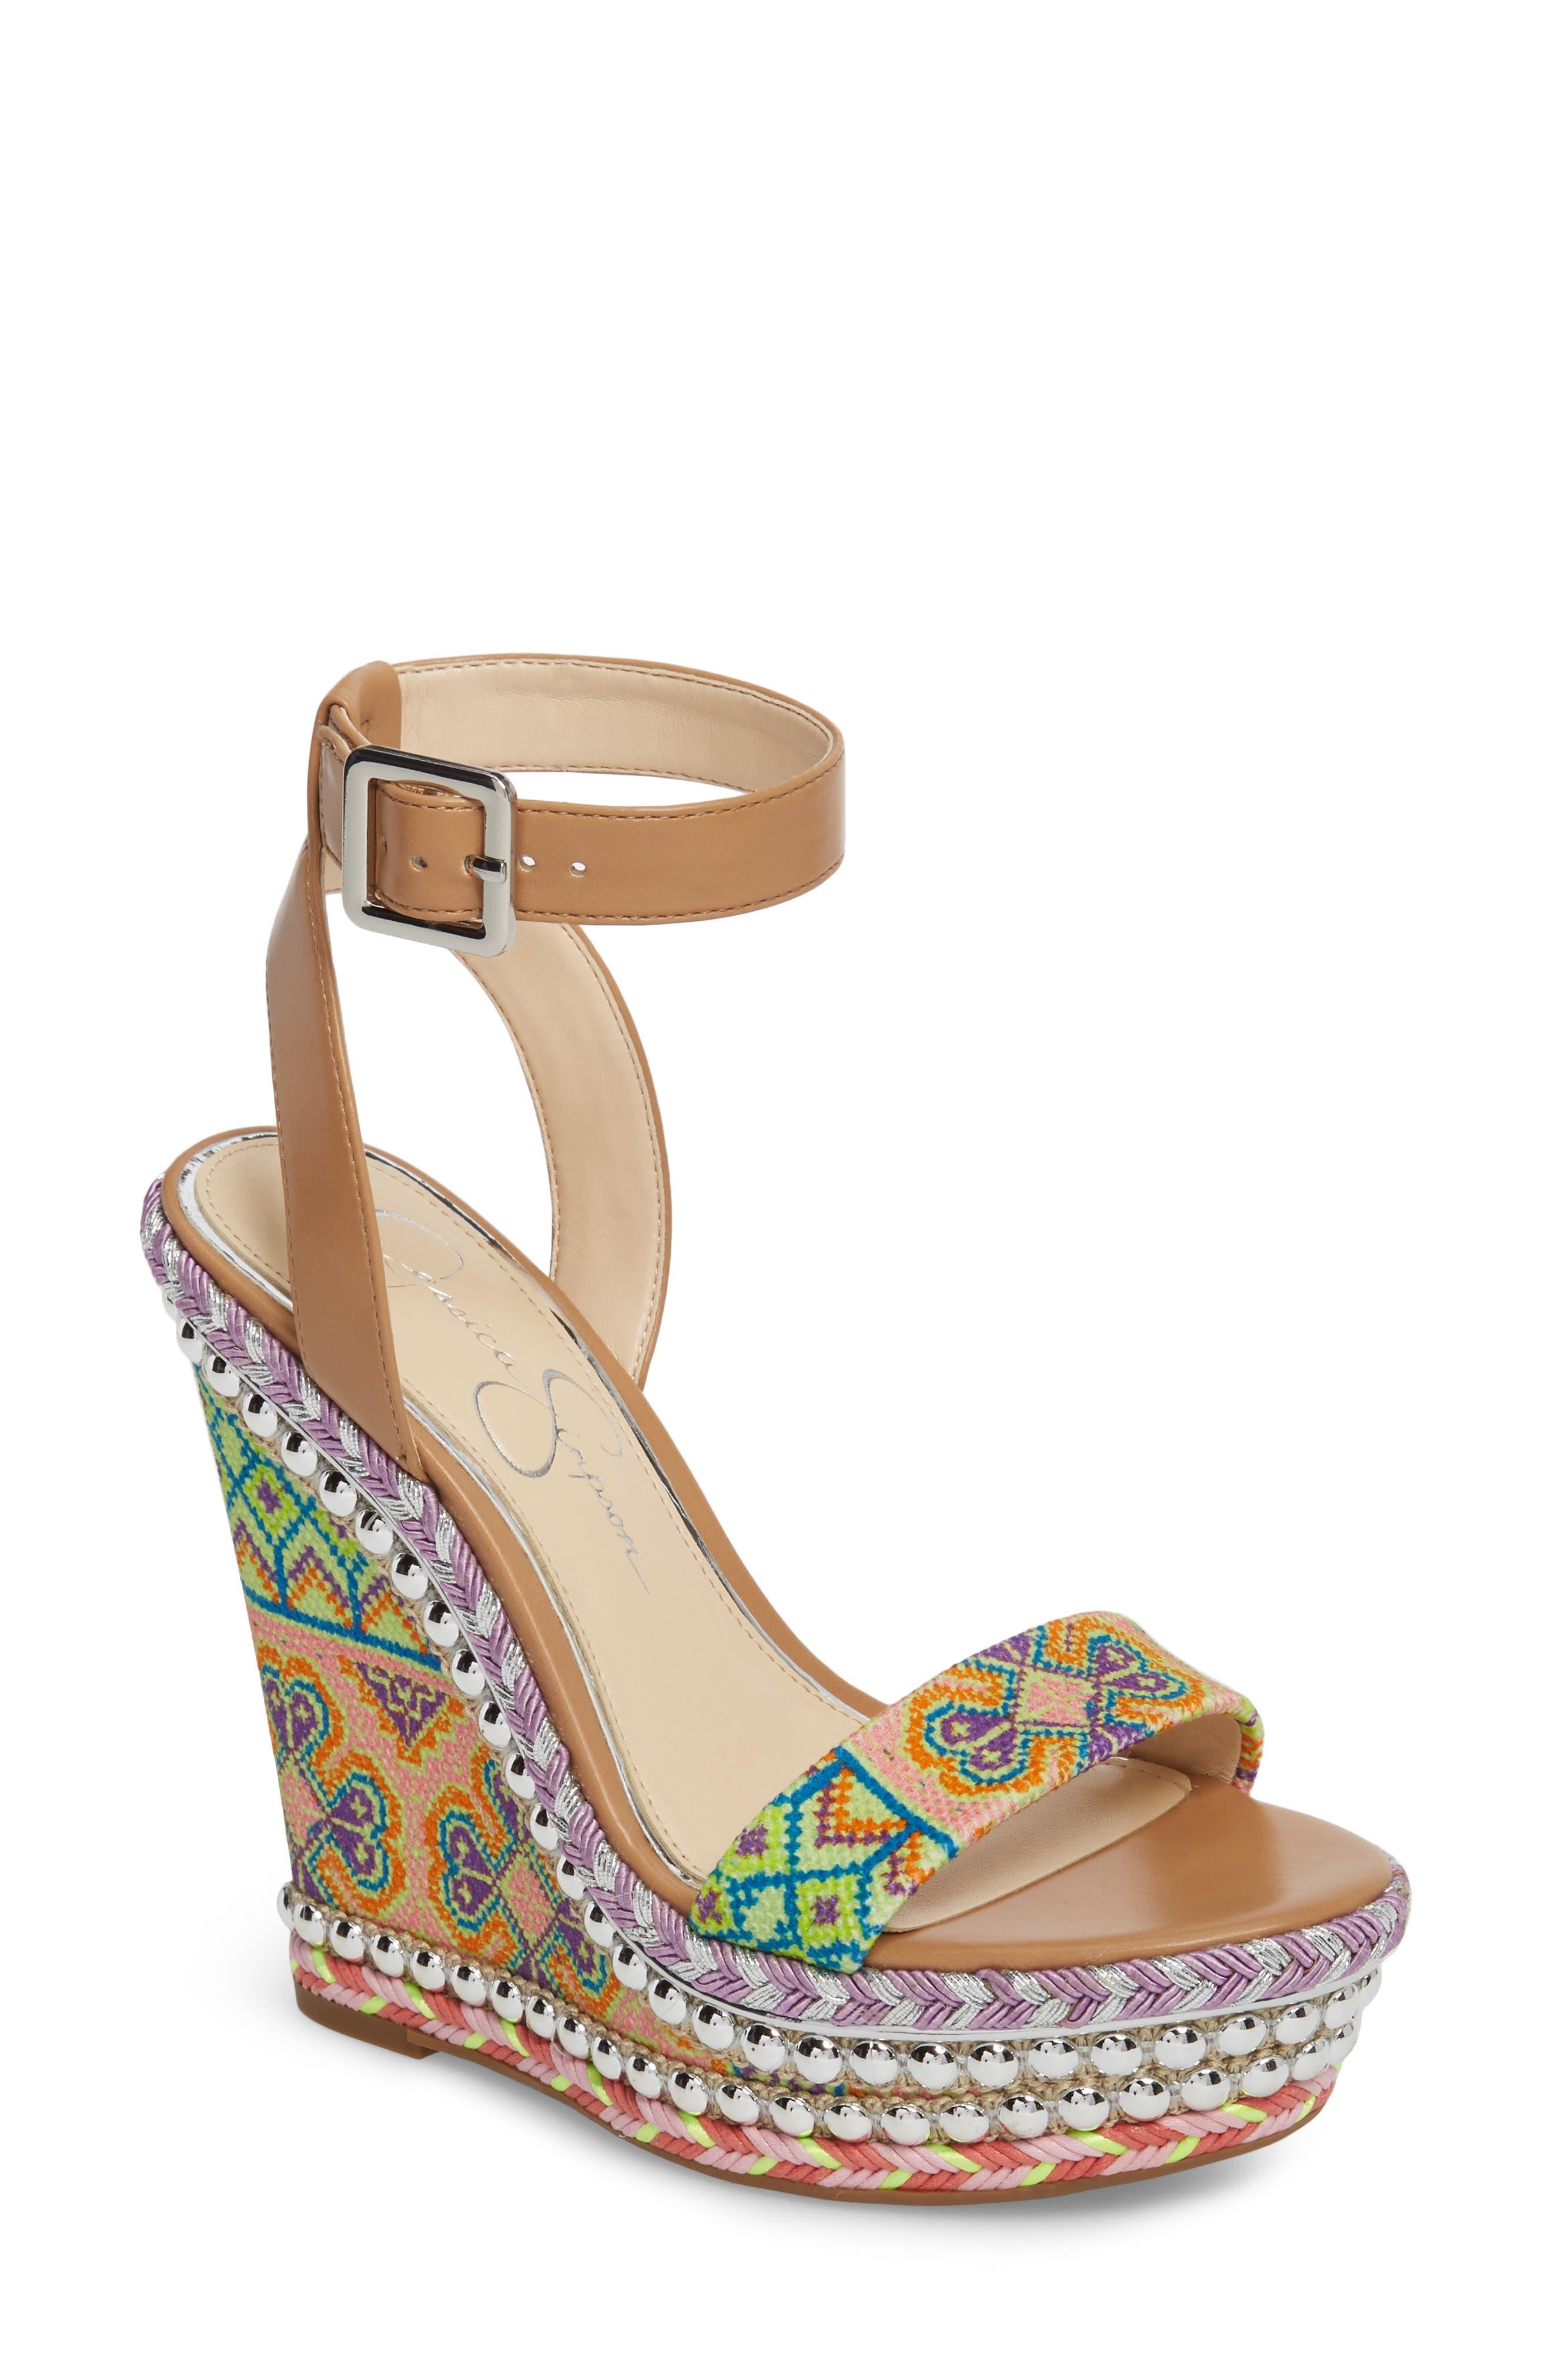 Alinda Embellished Wedge Sandal,                             Main thumbnail 1, color,                             320